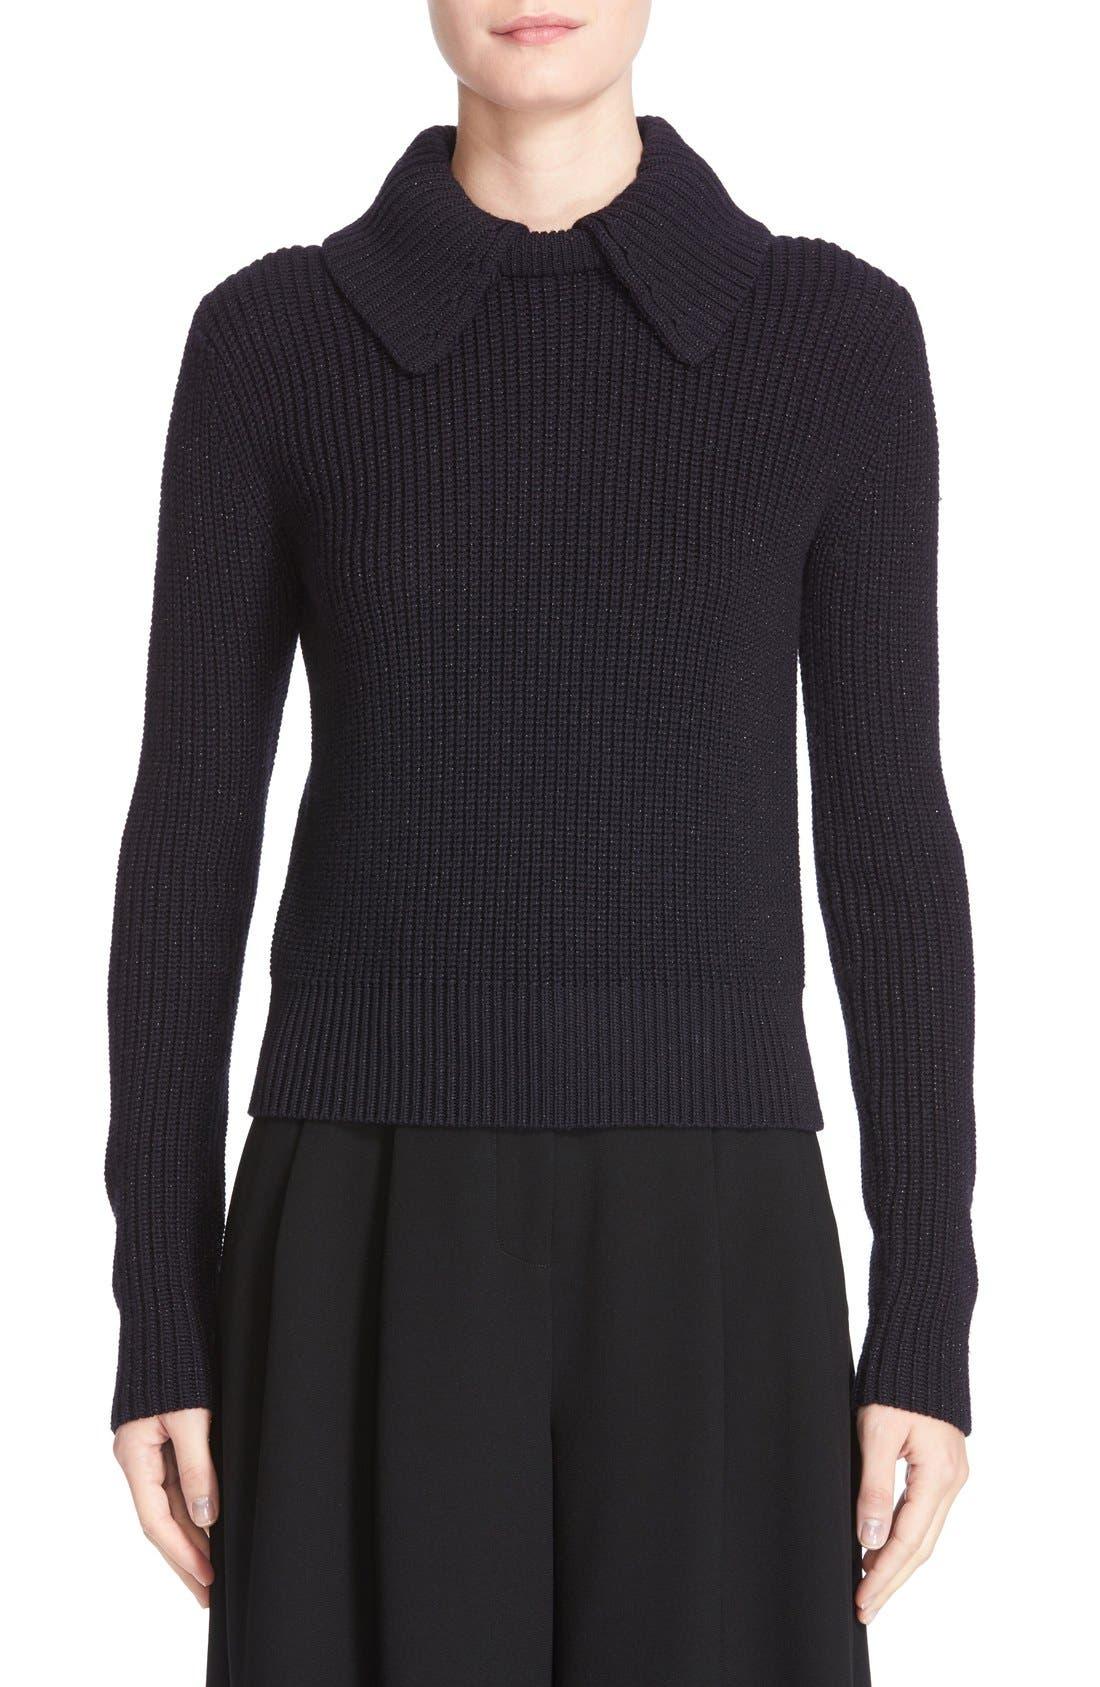 GREY JASON WU Shimmer Merino Wool Blend Sweater